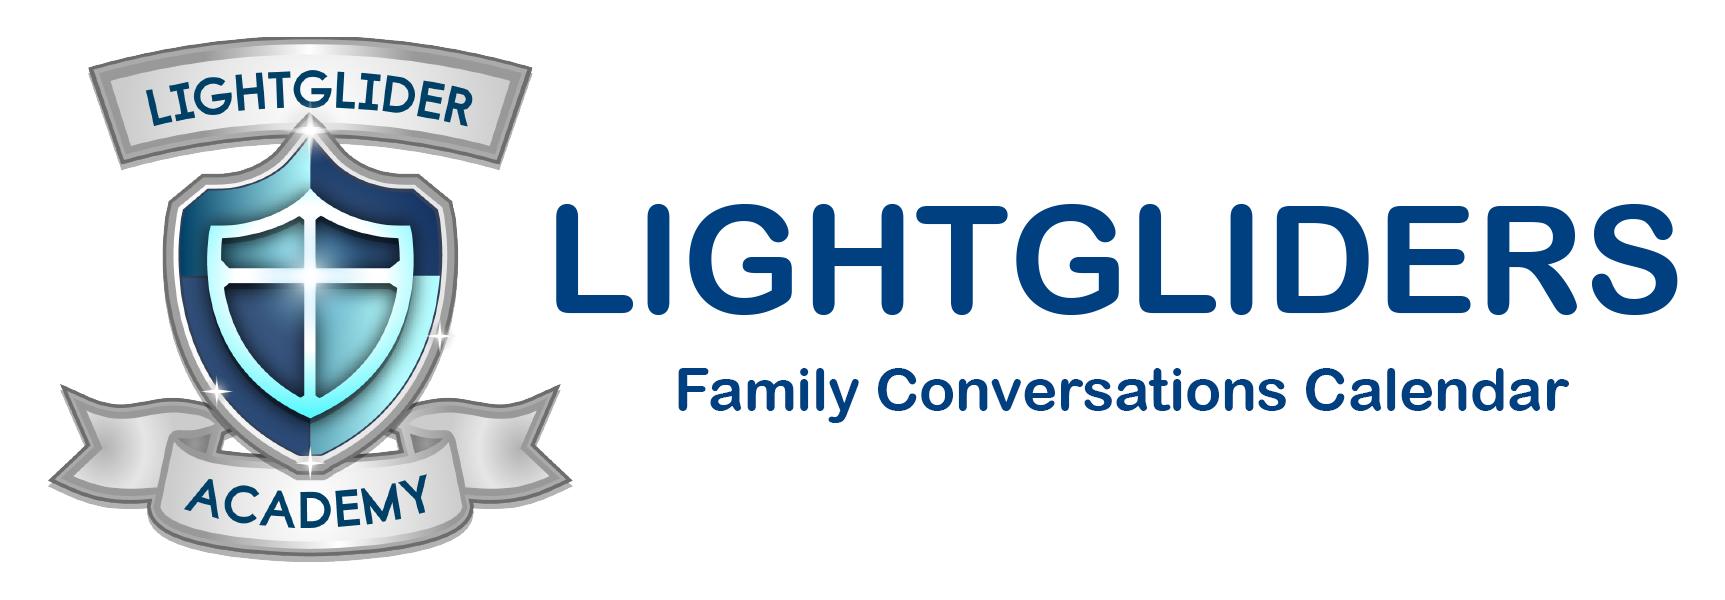 Lightgliders Family Conversations Calendar